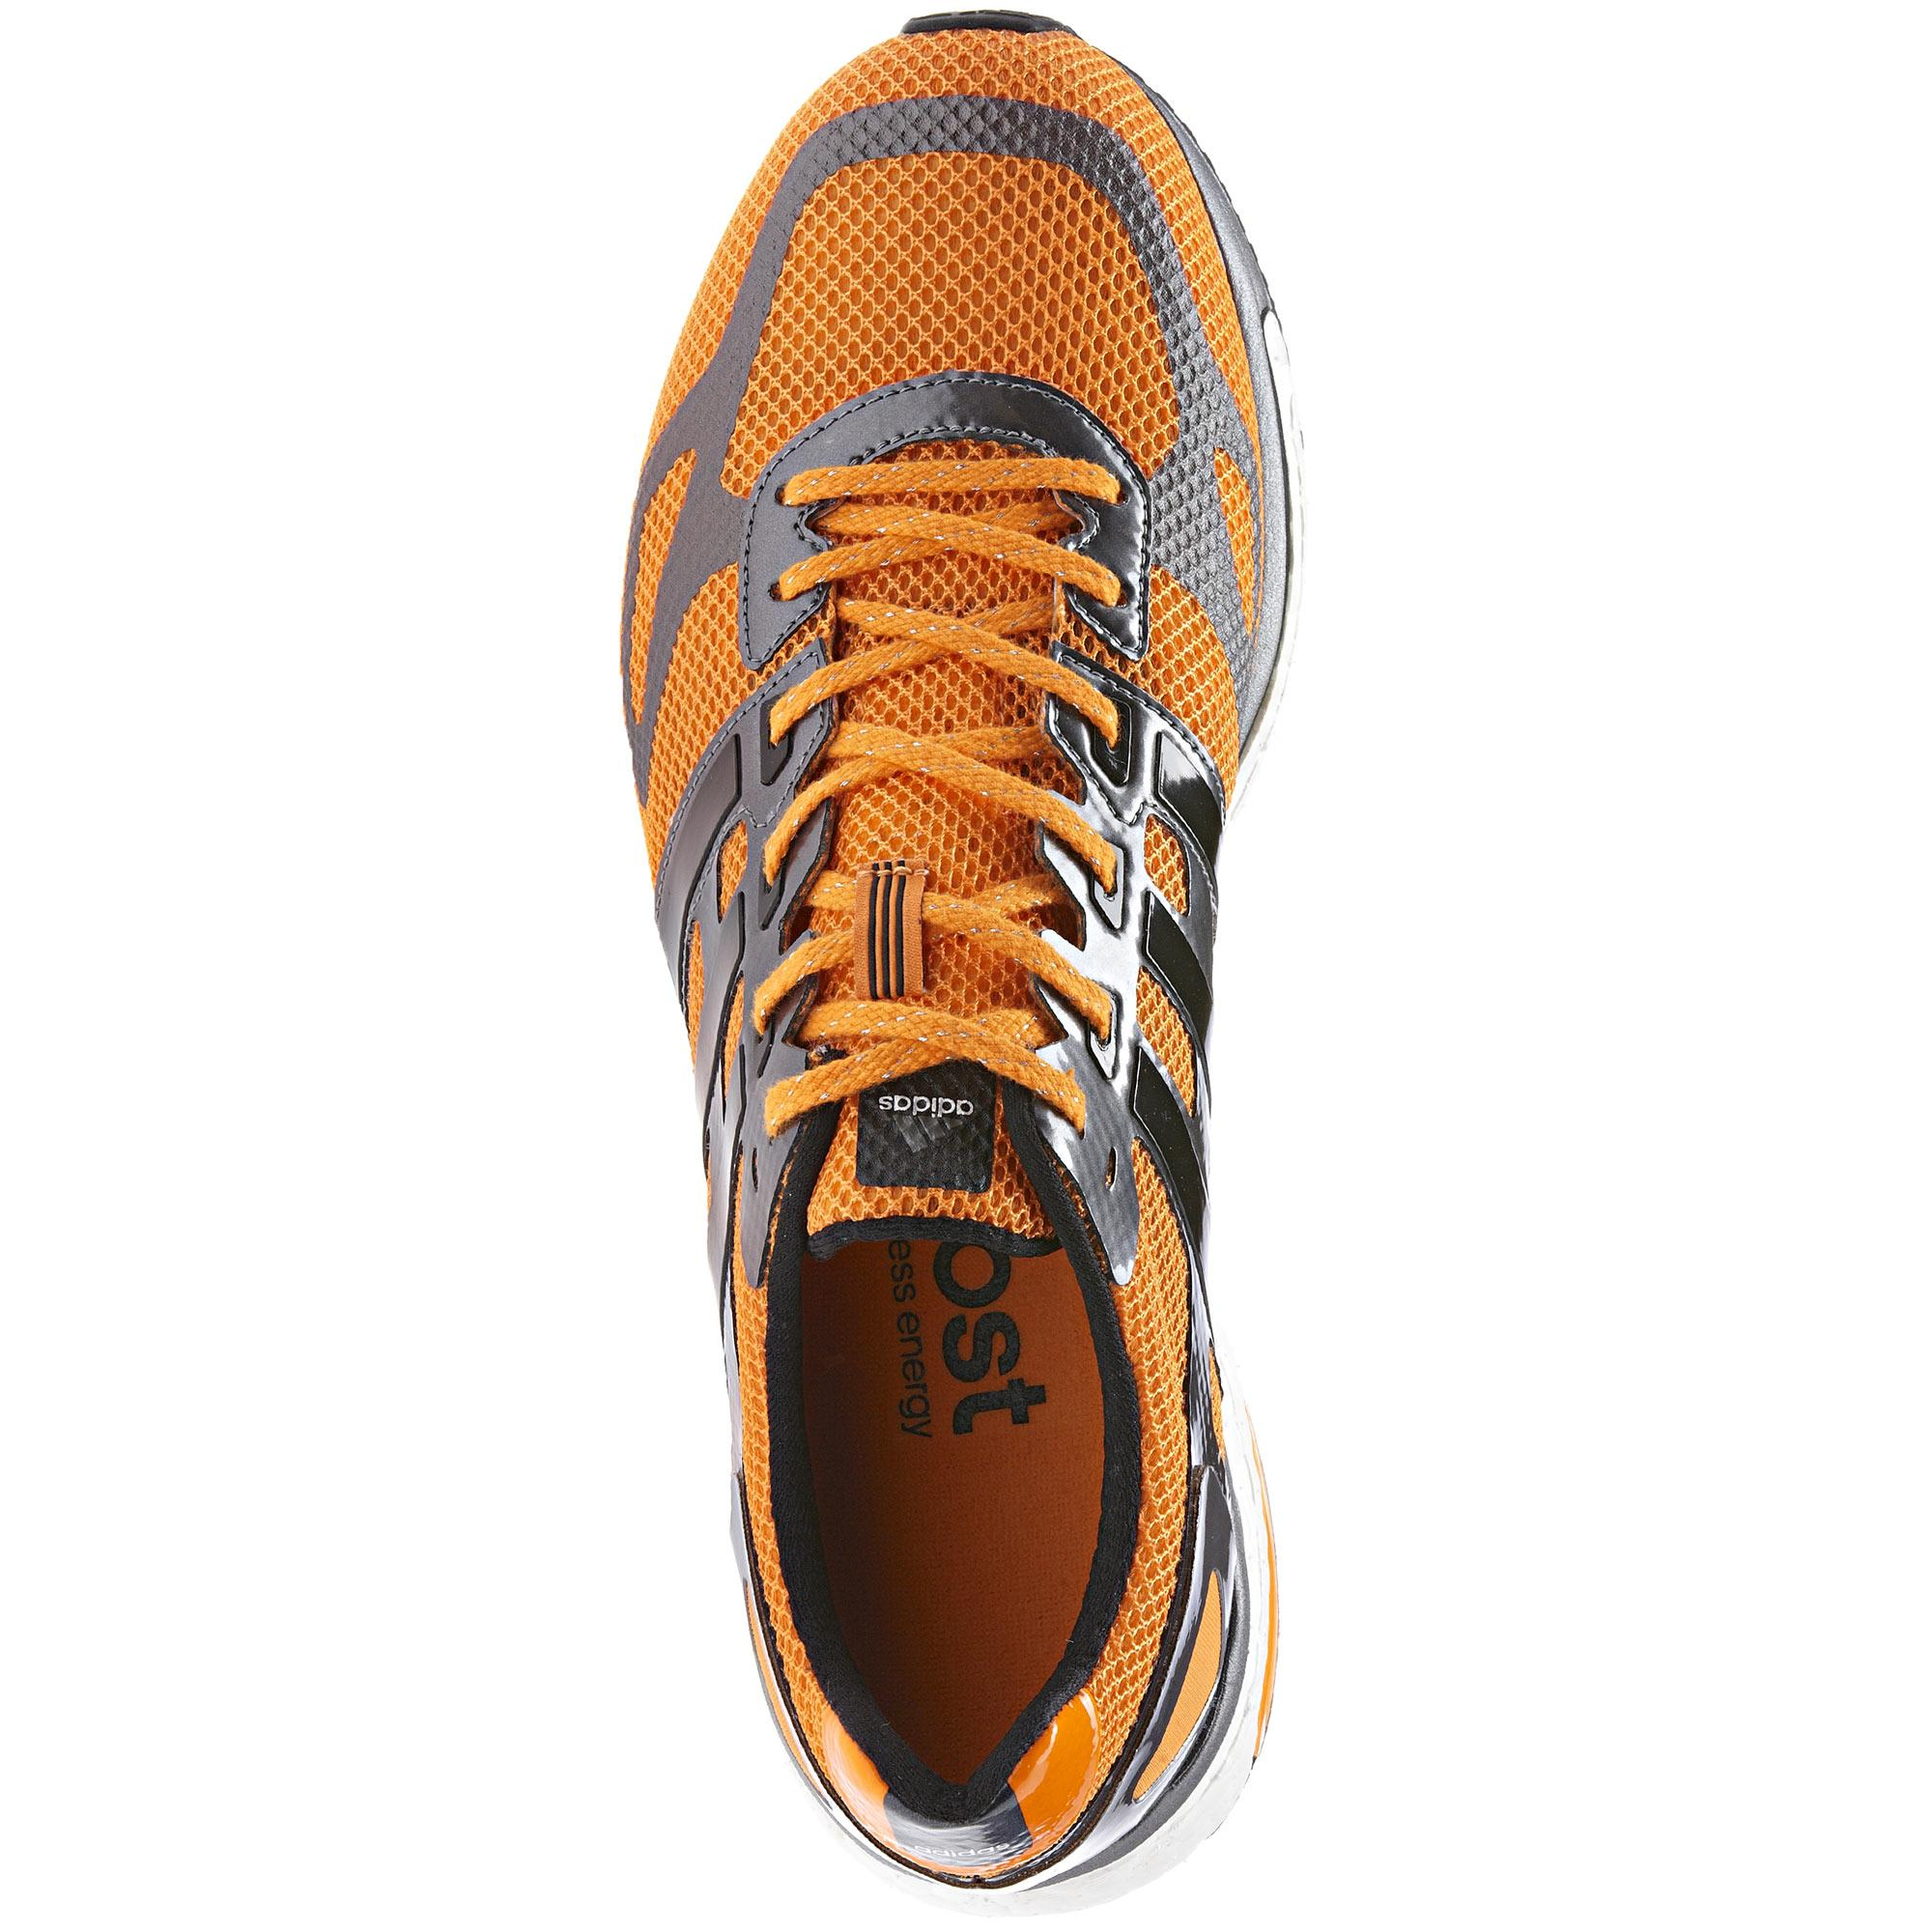 Adidas Adizero Adios Stimuler Chaussures Hommes Zeste / Noir pdOosOXaWx